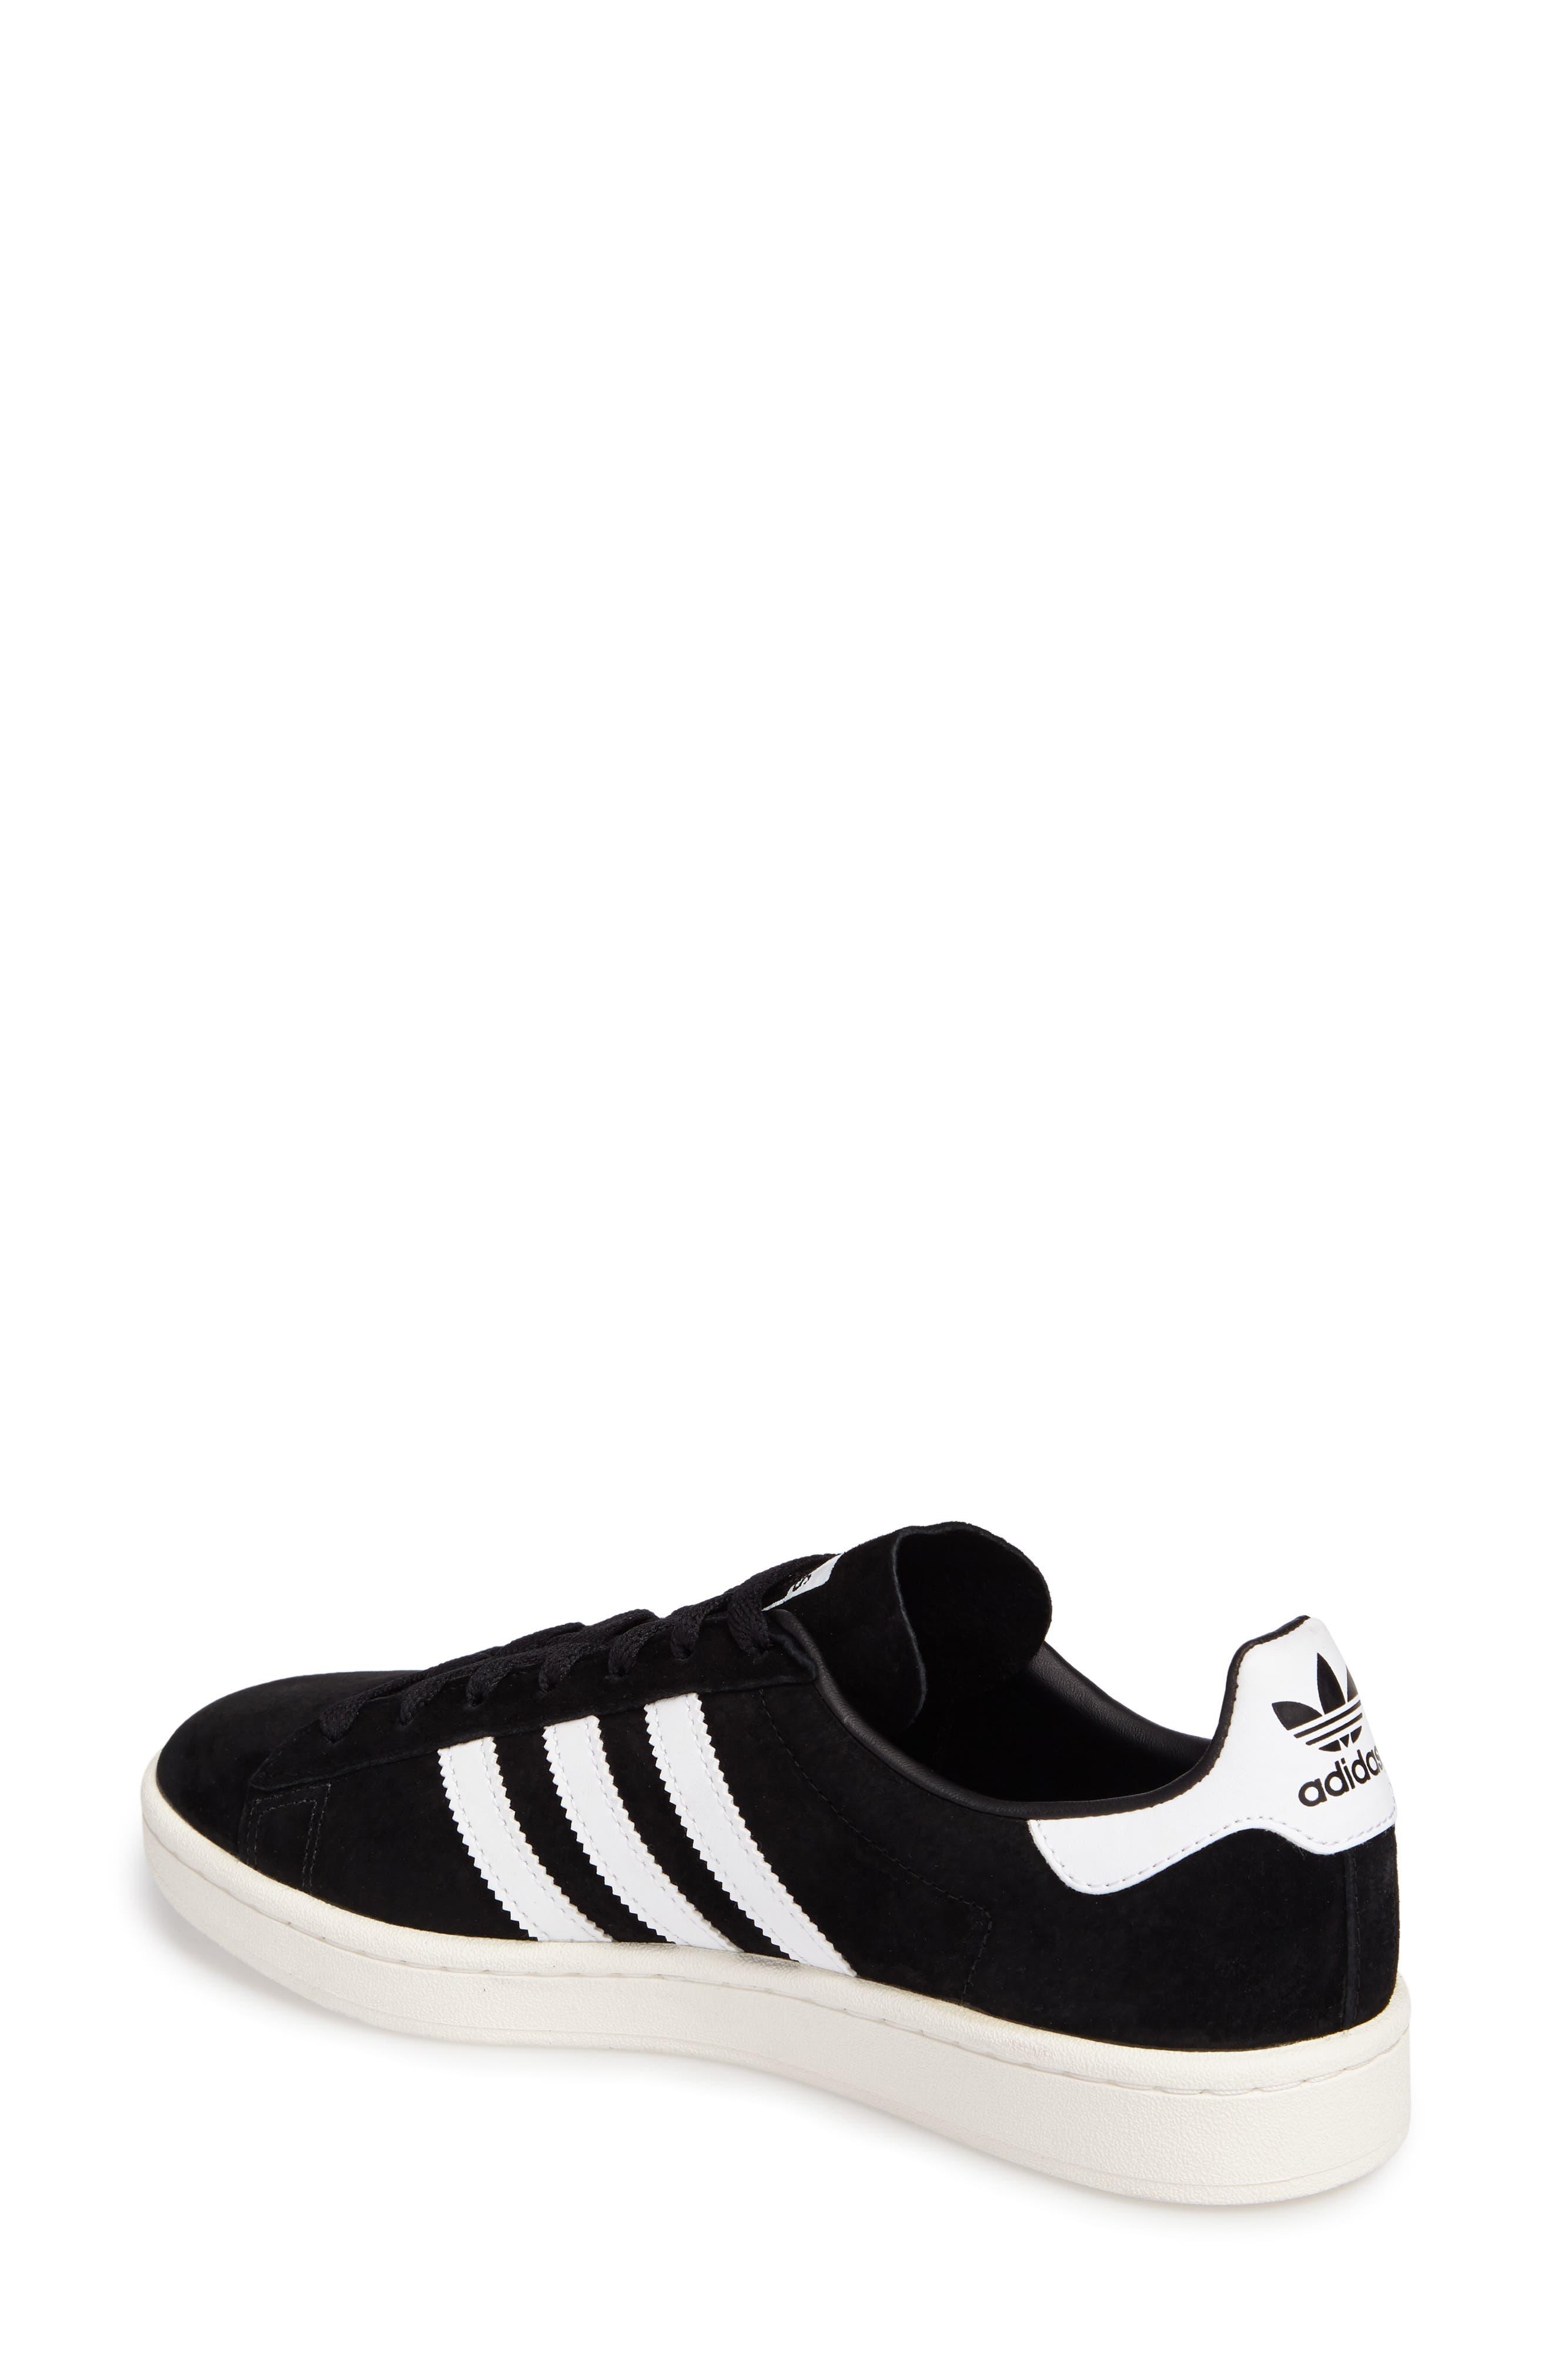 'Campus' Sneaker,                             Alternate thumbnail 2, color,                             Core Black/ White